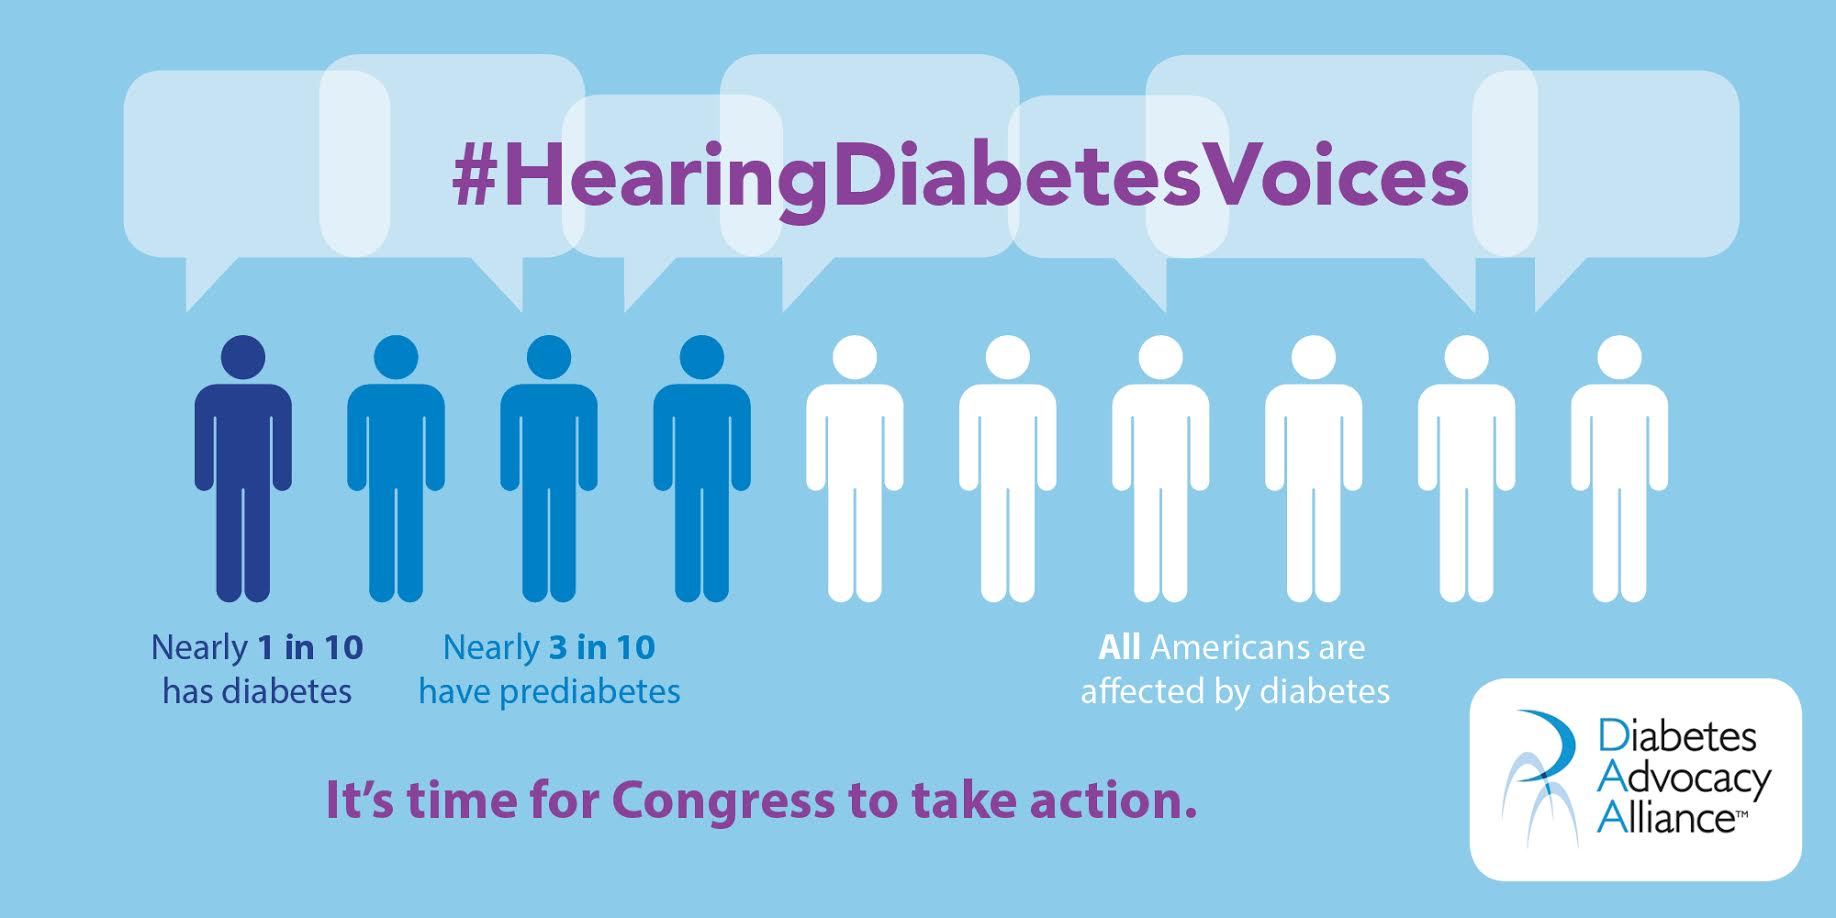 #HearingDiabetesVoices